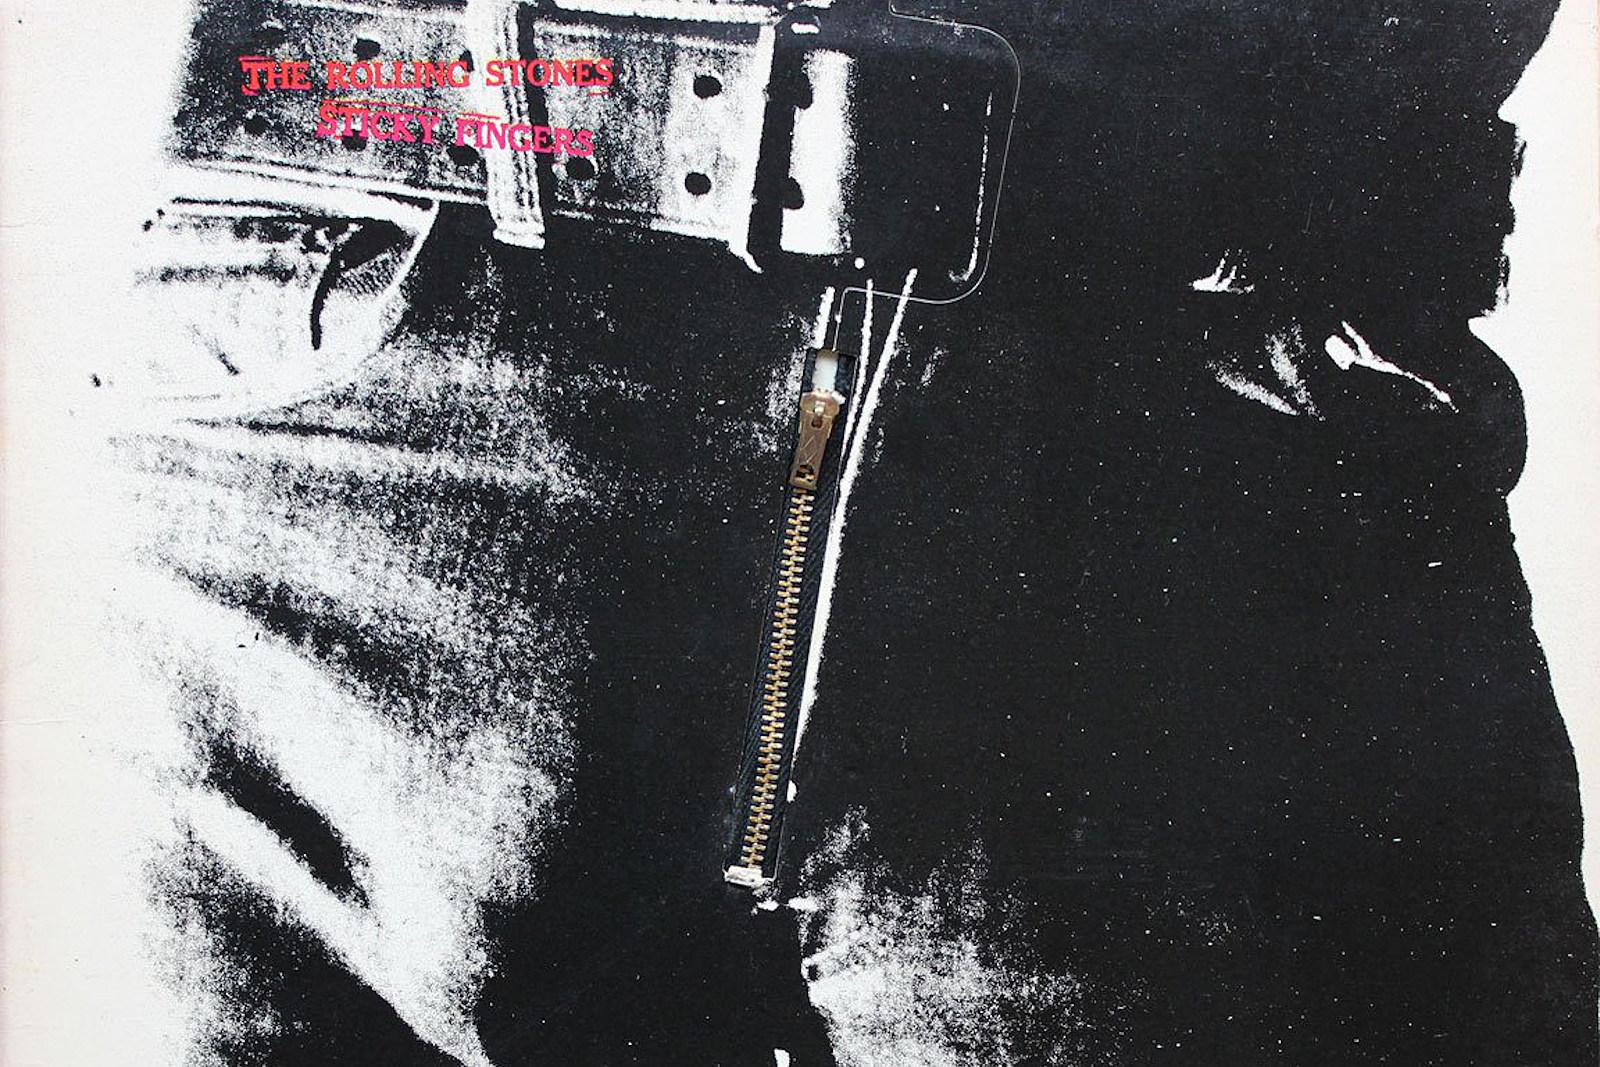 Mick Jagger on 'Sticky Fingers' Zipper Damage: 'We Were F—ed'